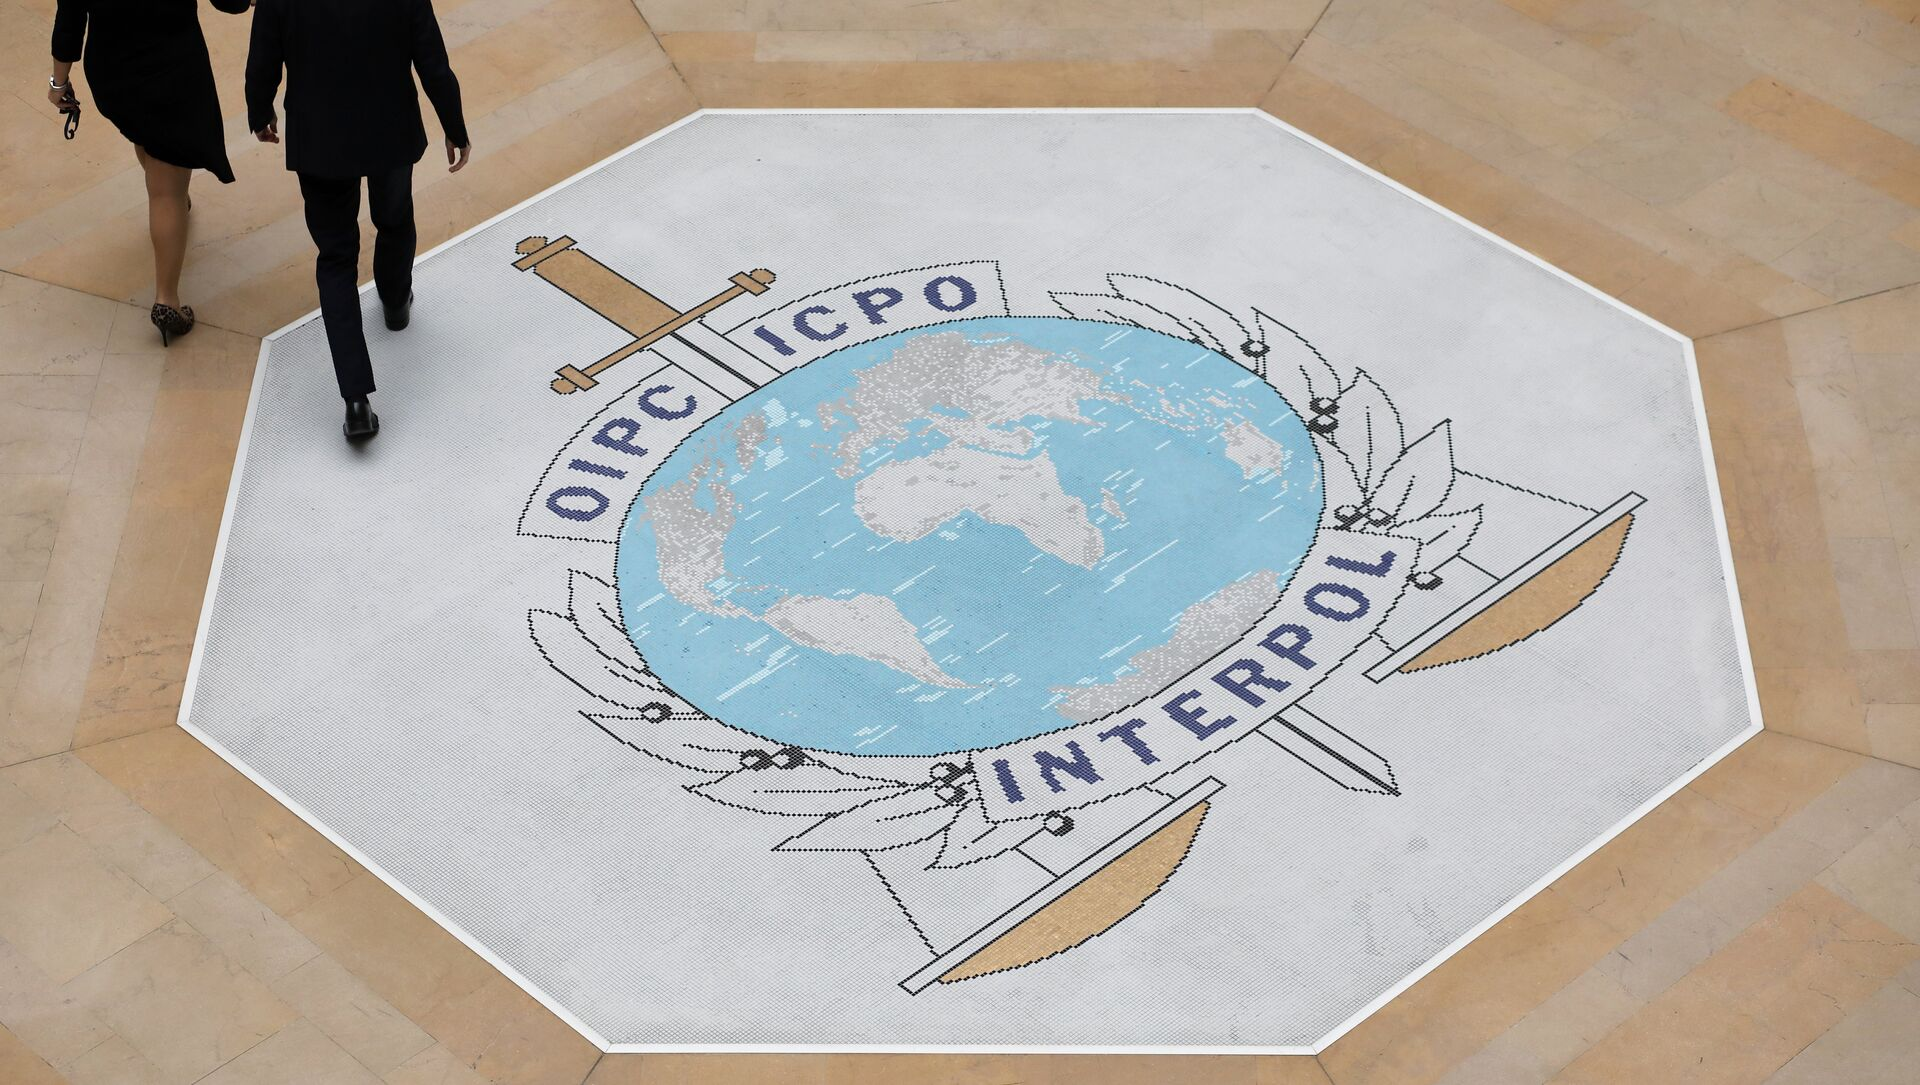 El logo de Interpol - Sputnik Mundo, 1920, 06.05.2020